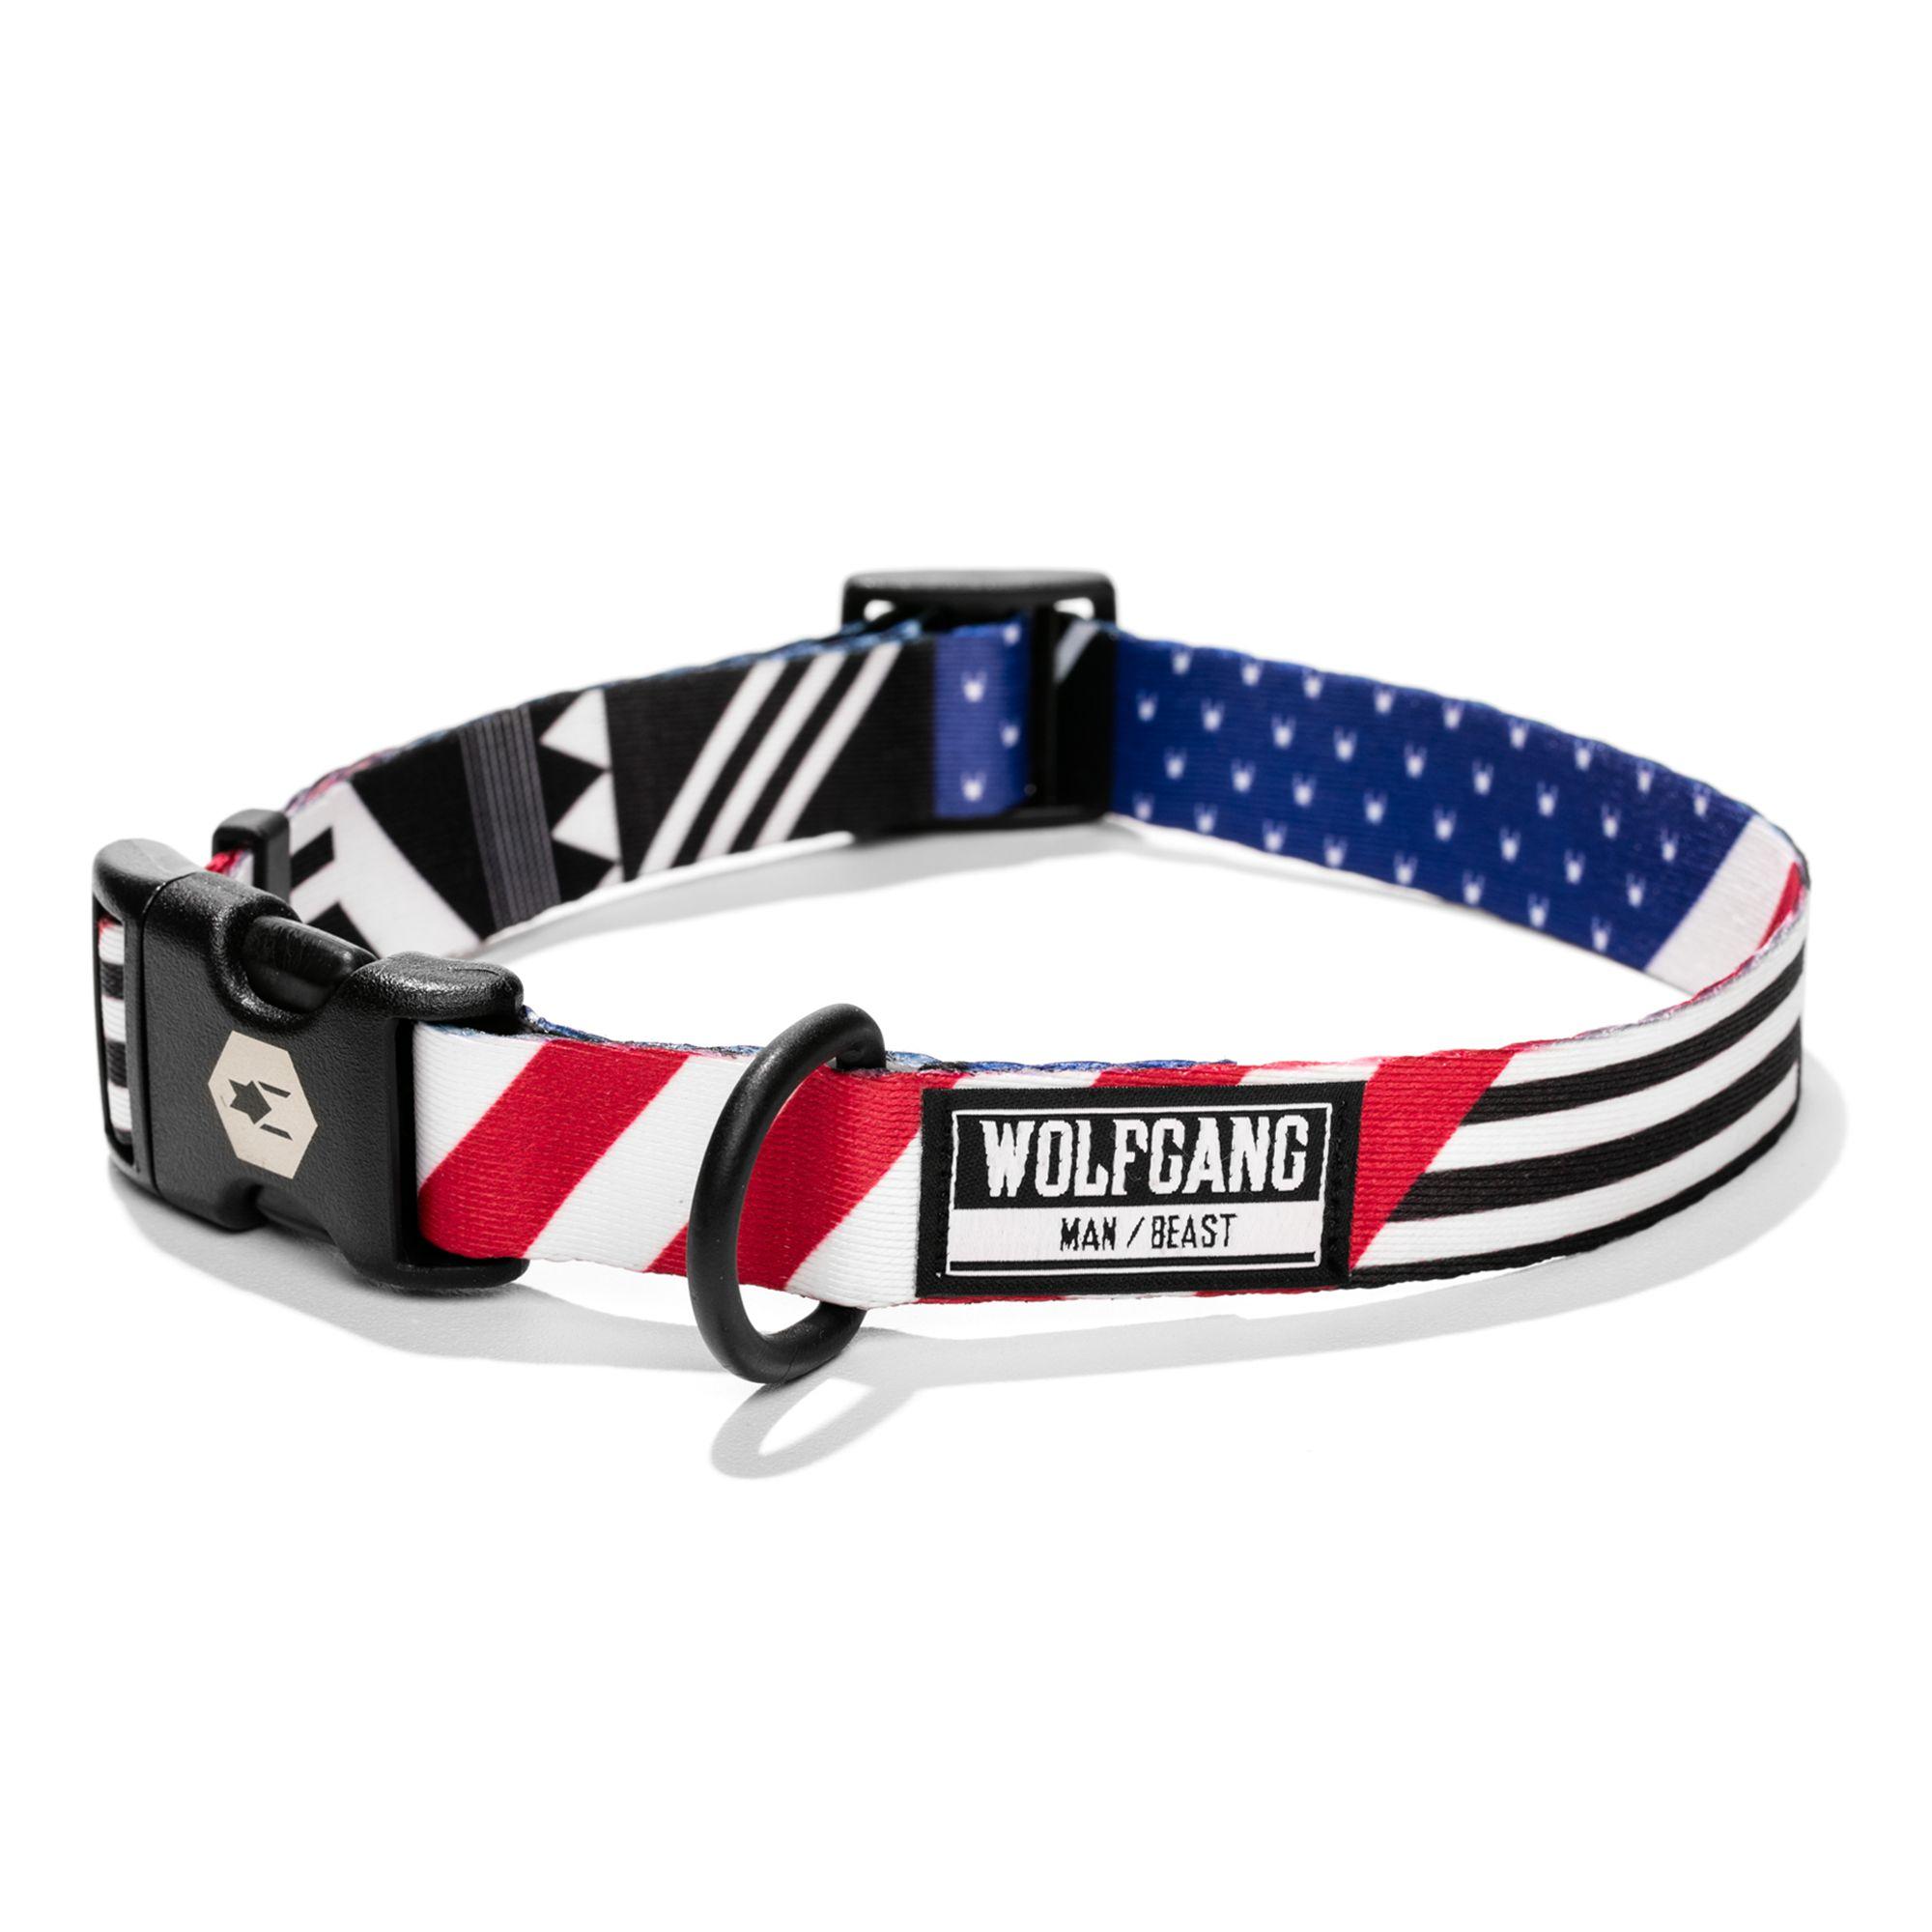 Wolfgang Man And Beast Pledgeallegiance Dog Collar Size Medium